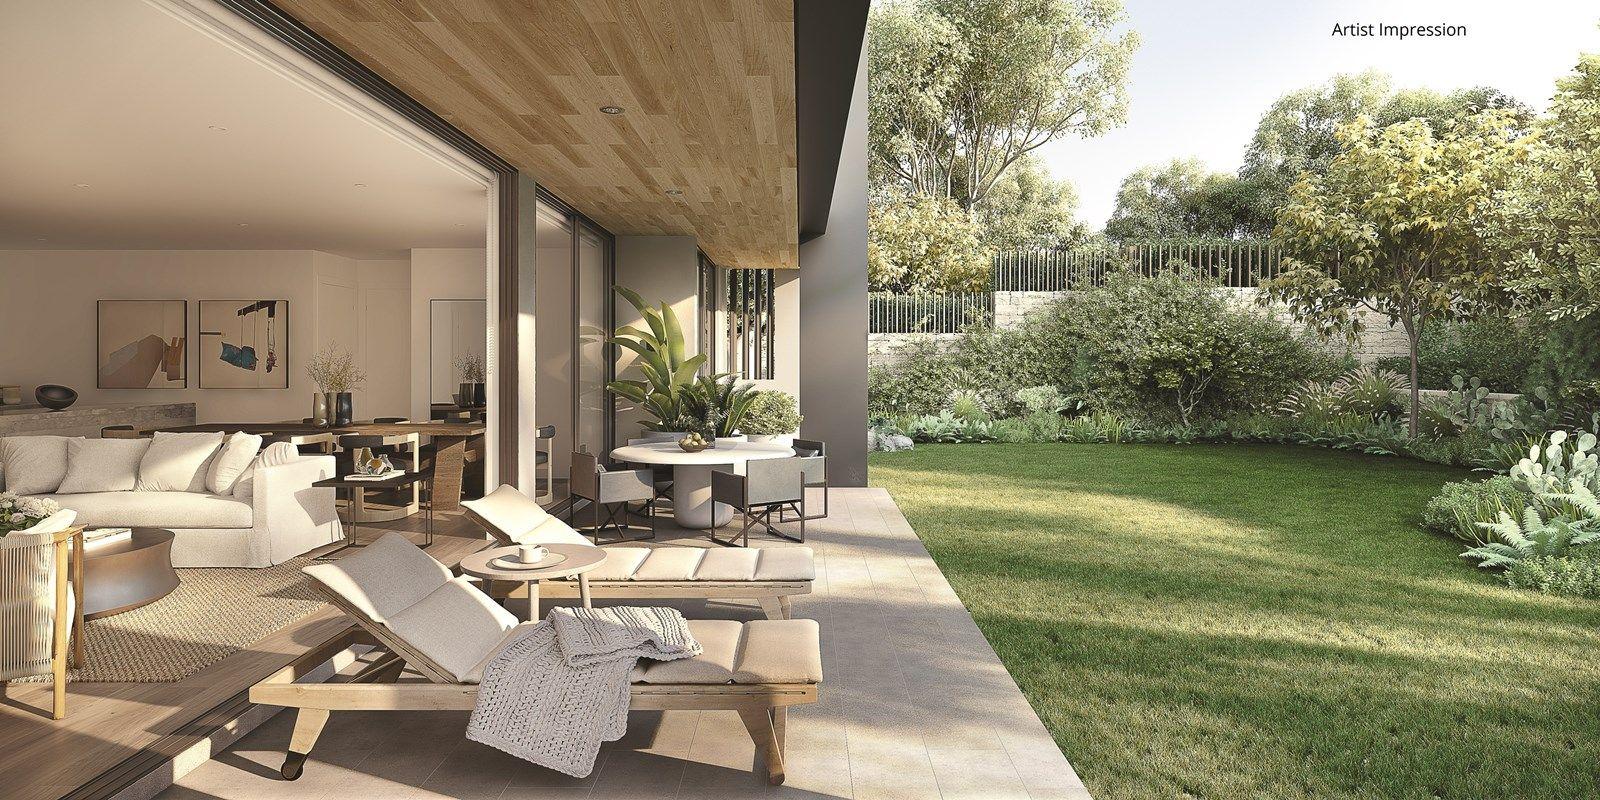 26-28 Boronia Road, Bellevue Hill, NSW 2023, Image 0